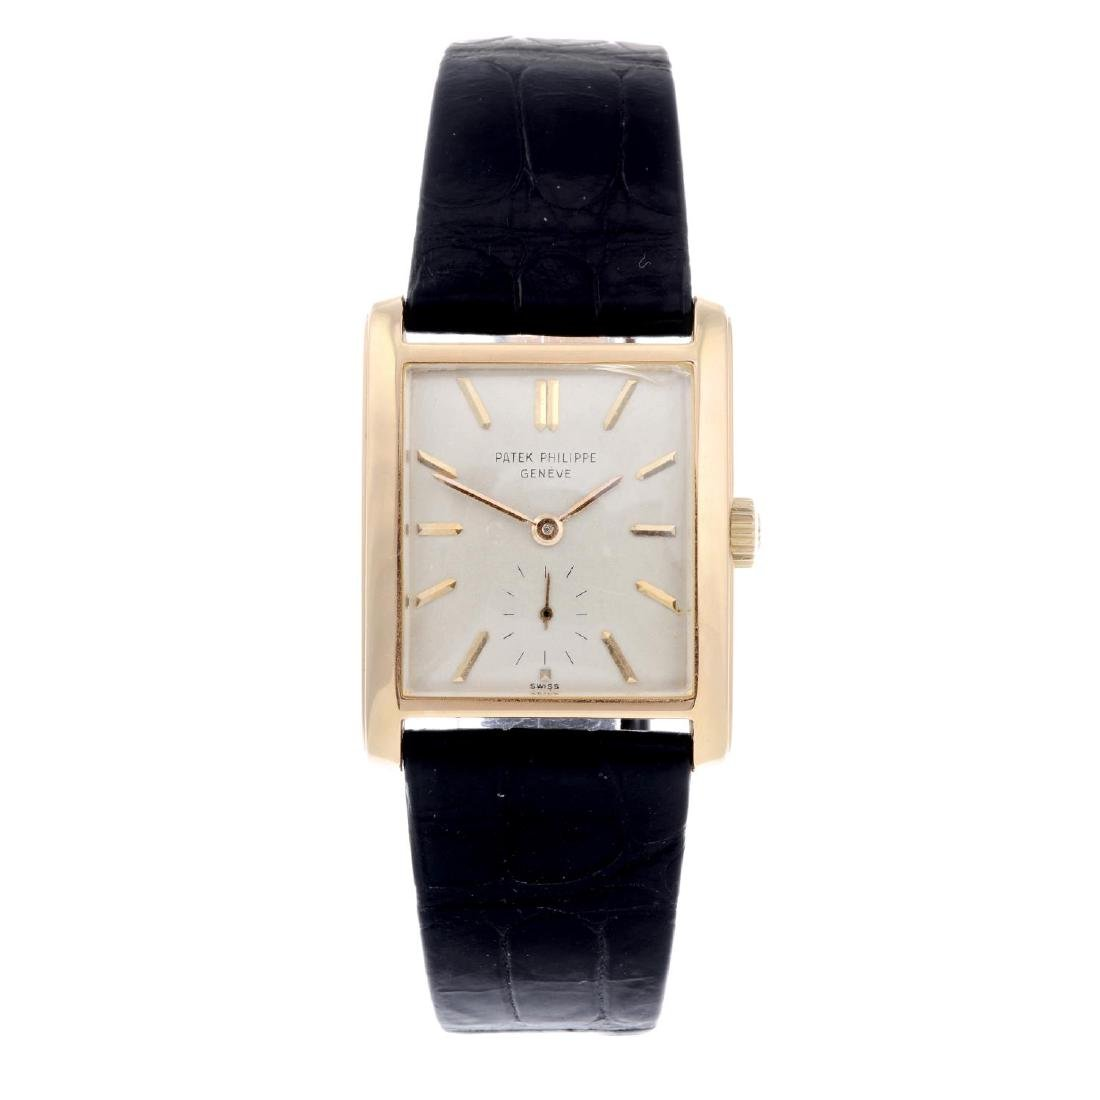 PATEK PHILIPPE - a gentleman's Rectangular wrist watch.